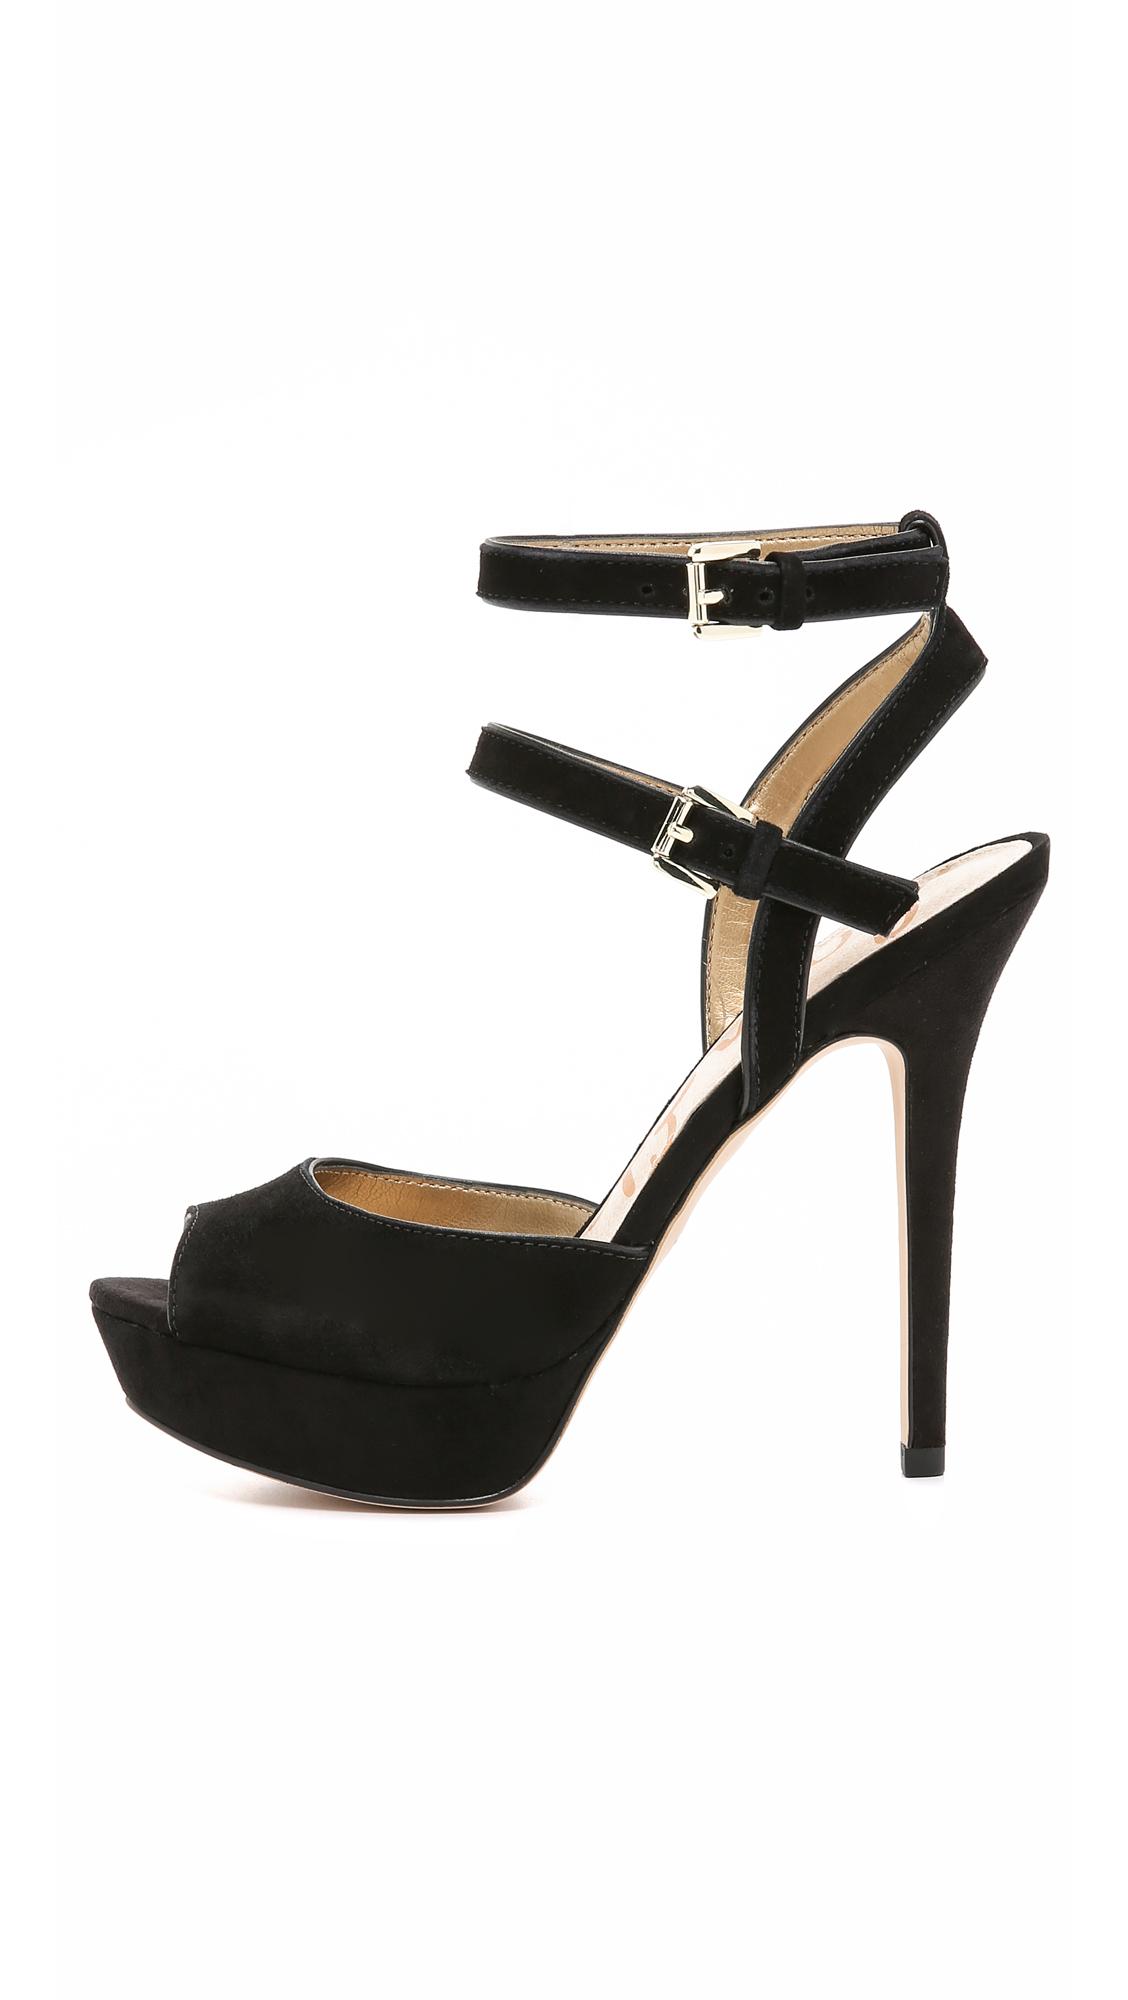 cc7220ae80e9fe Lyst - Sam Edelman Nadine Suede Platform Sandals - Black in Black